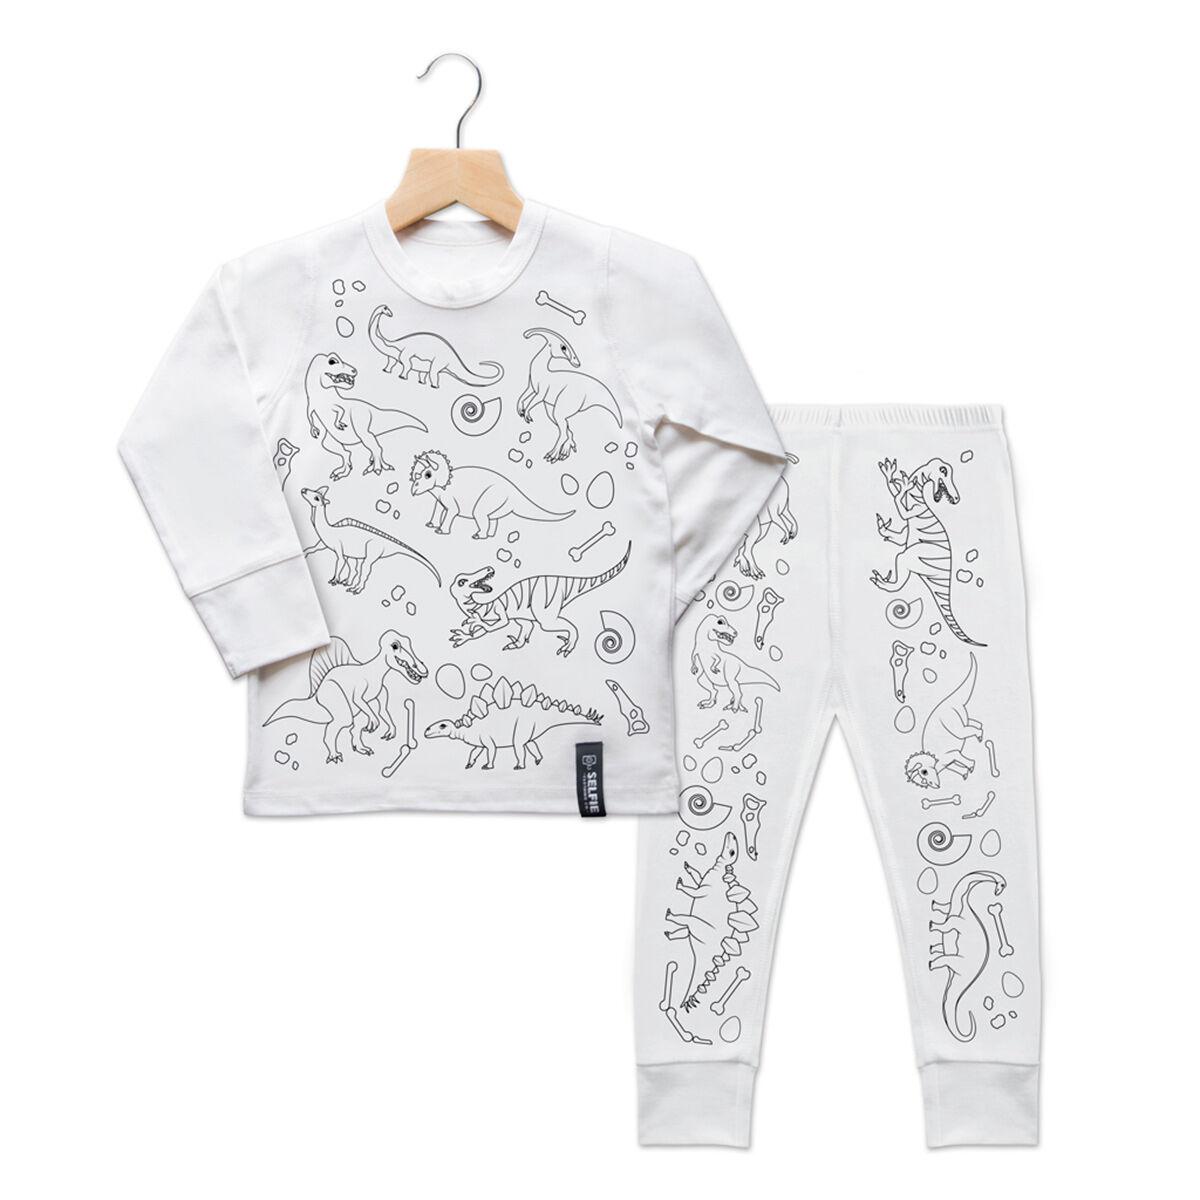 Selfie Clothing Co Toddler/Big Kid Color-In PJs - Dinosaur (Size: 3-4 y)